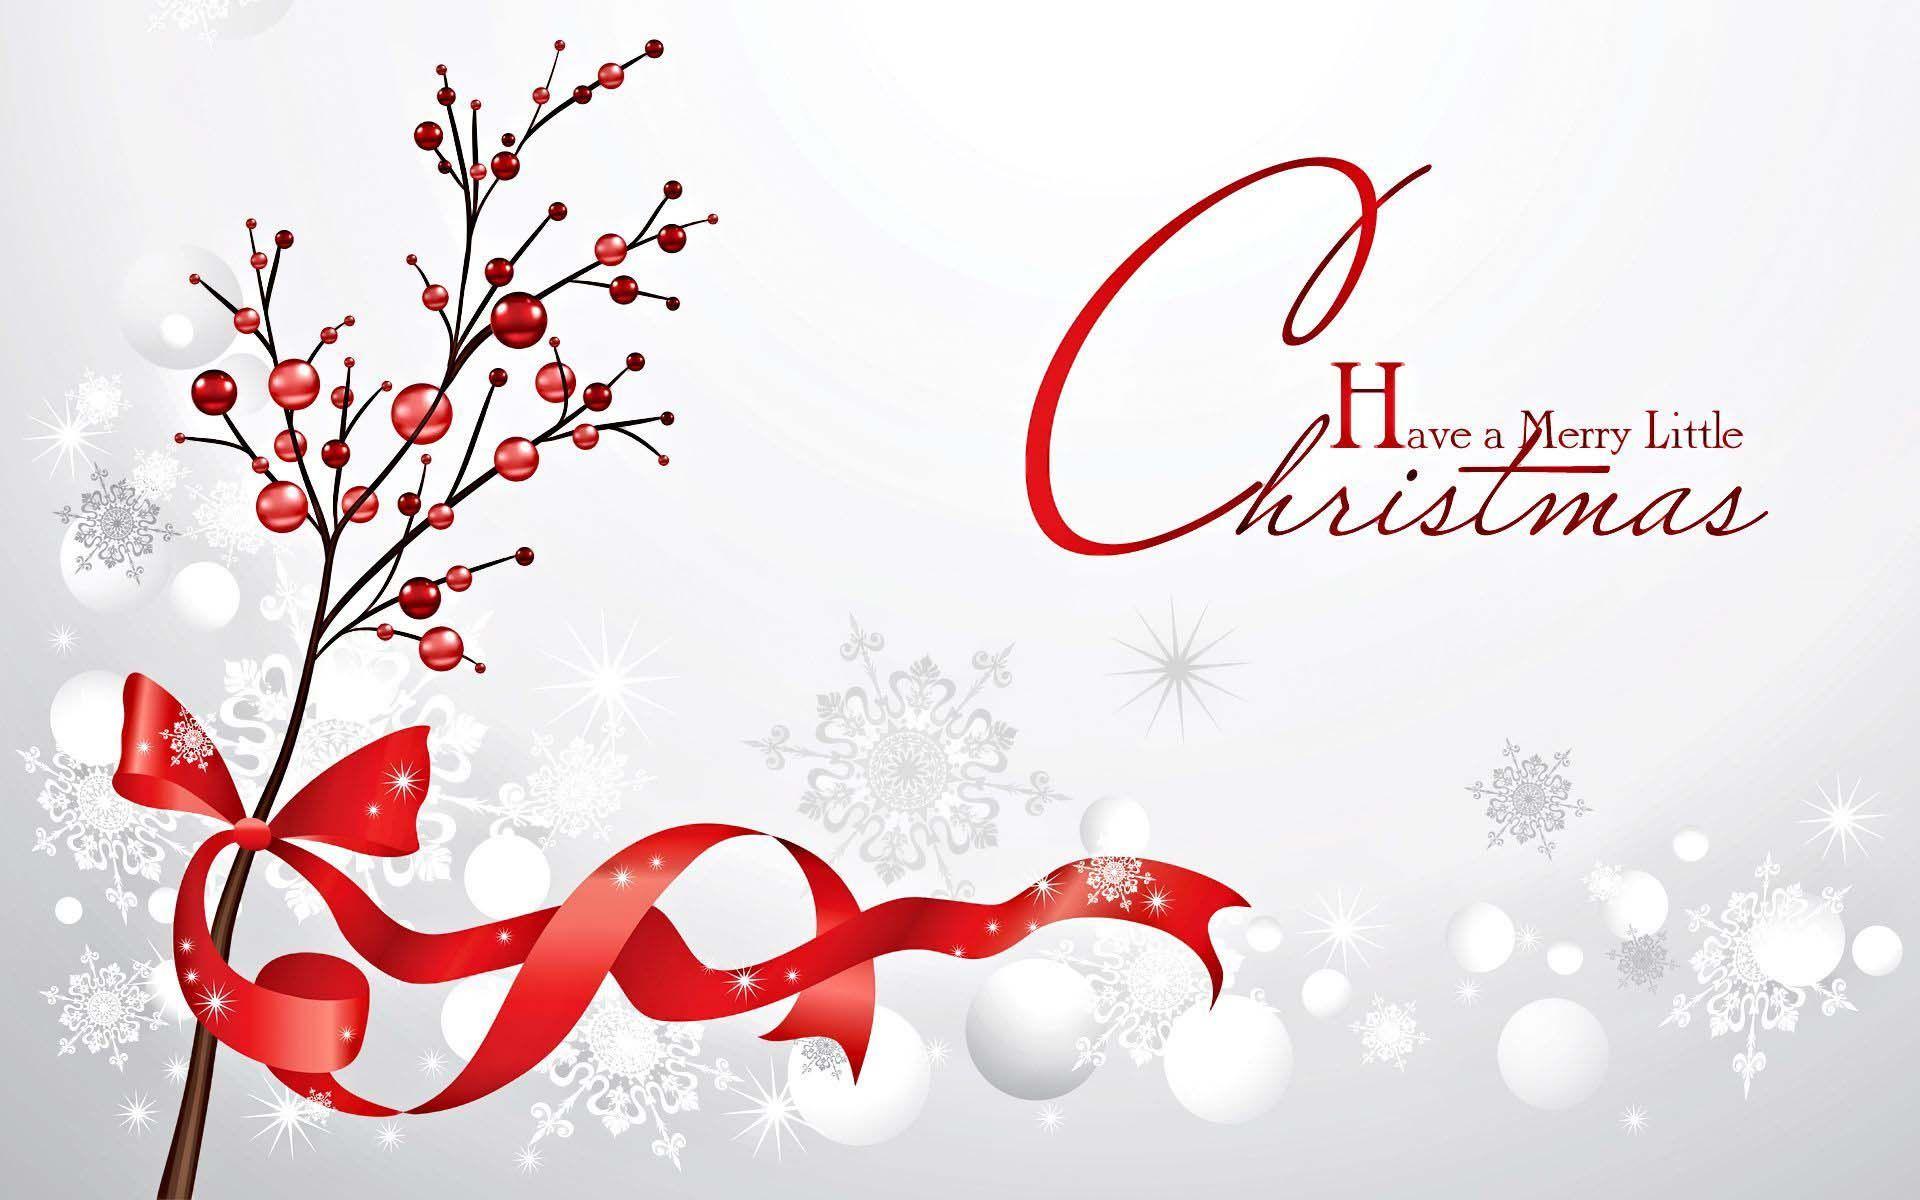 Merrychristmashdwallpaperfreedownloadforlaptopor